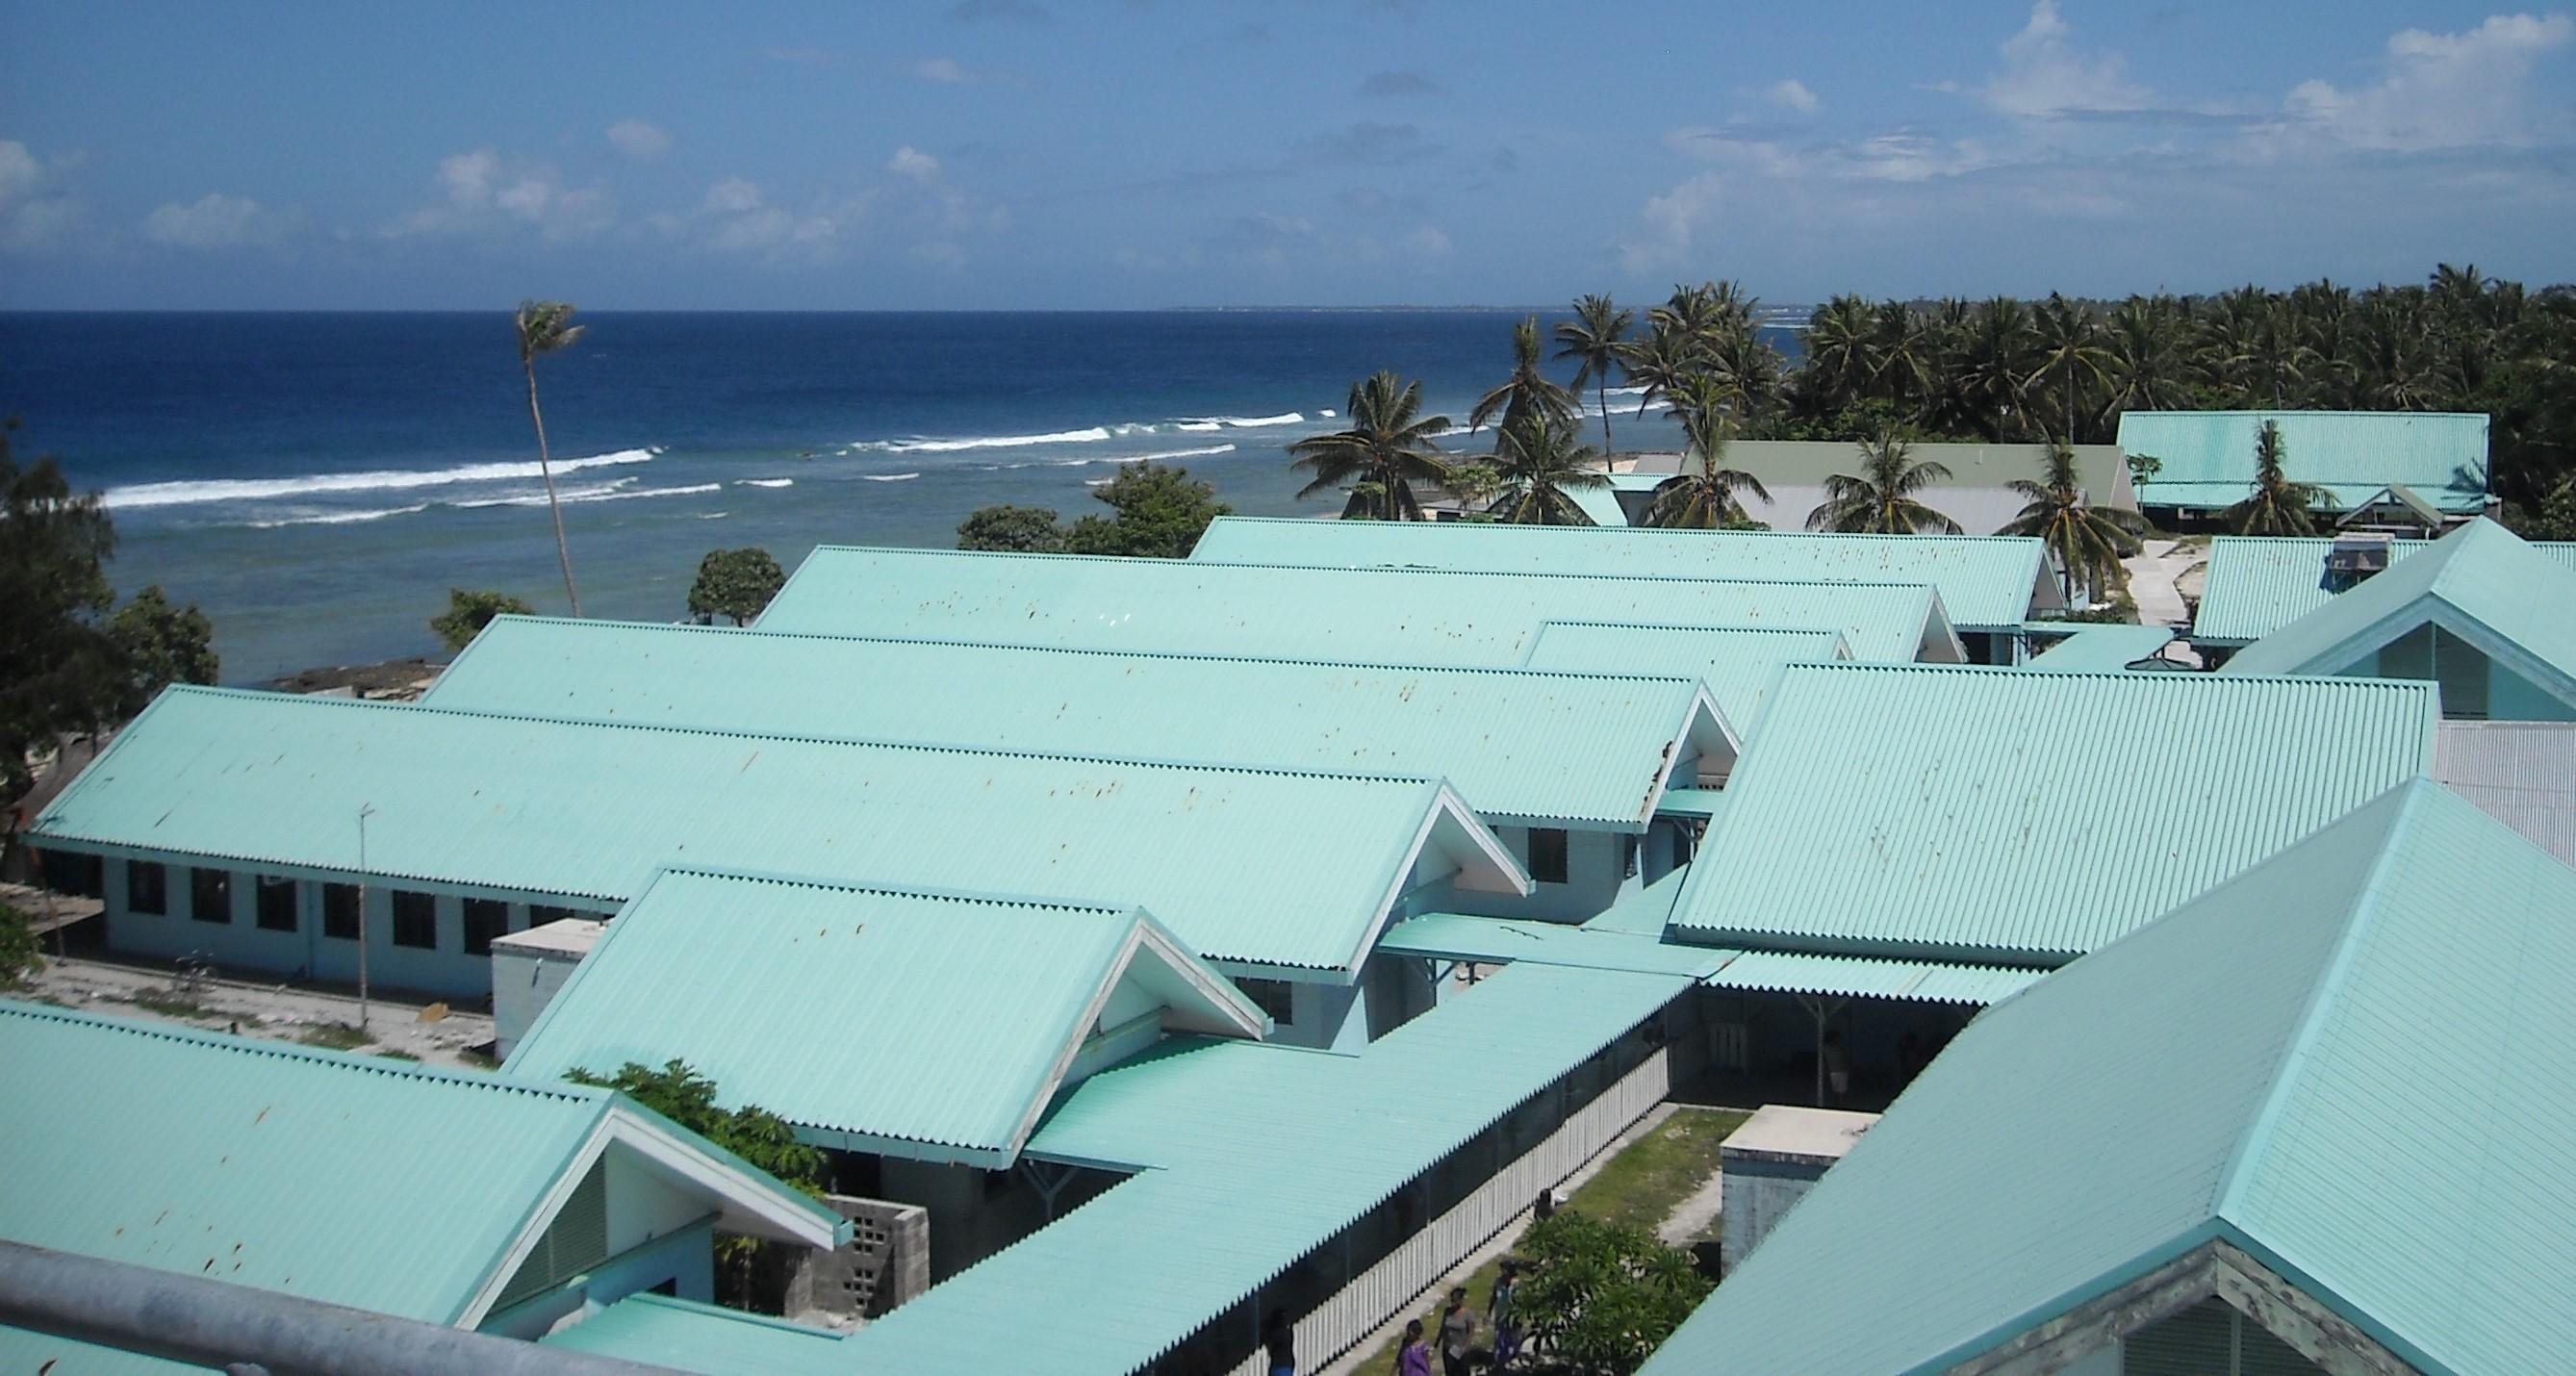 Betio-Tungaru-hospital.jpg#asset:3085